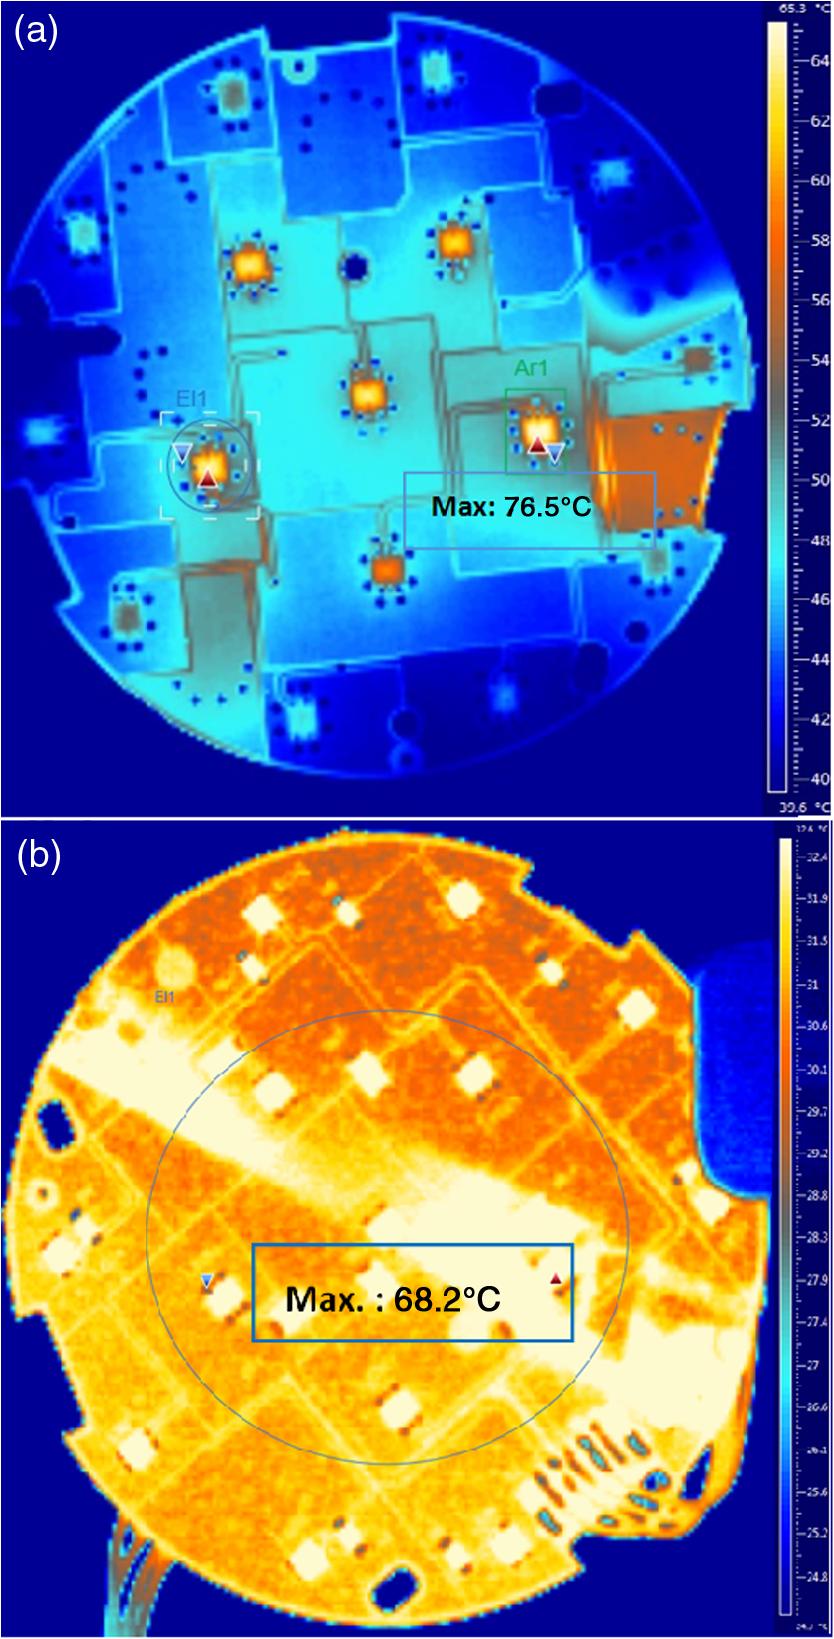 Conduction-driven cooling of LED-based automotive LED lighting